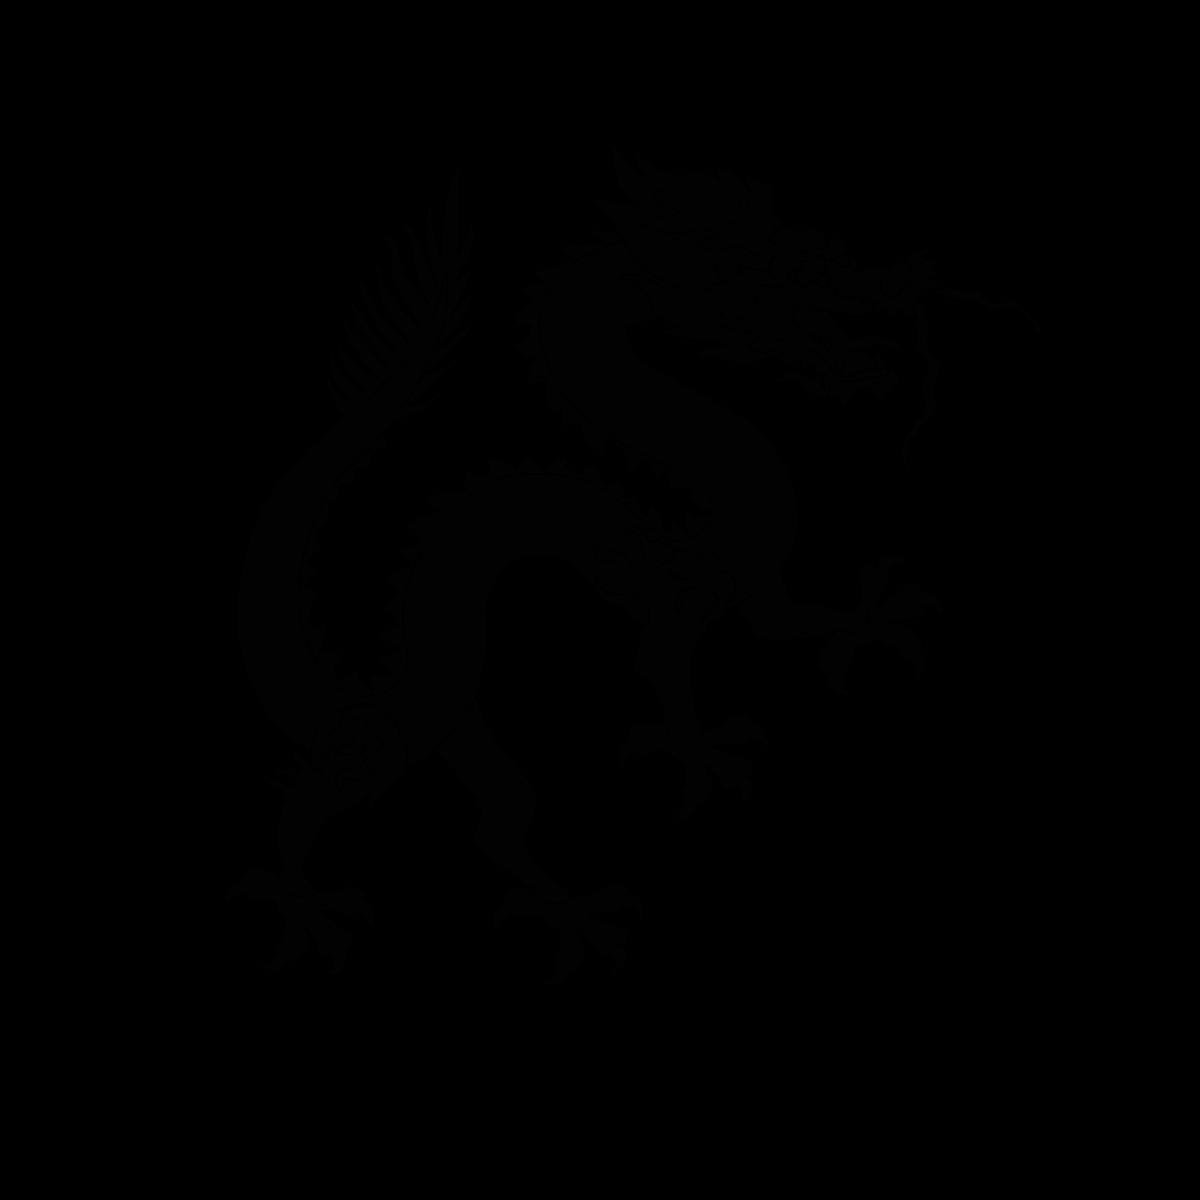 Zodiac wikipedia . Lizard clipart water dragon